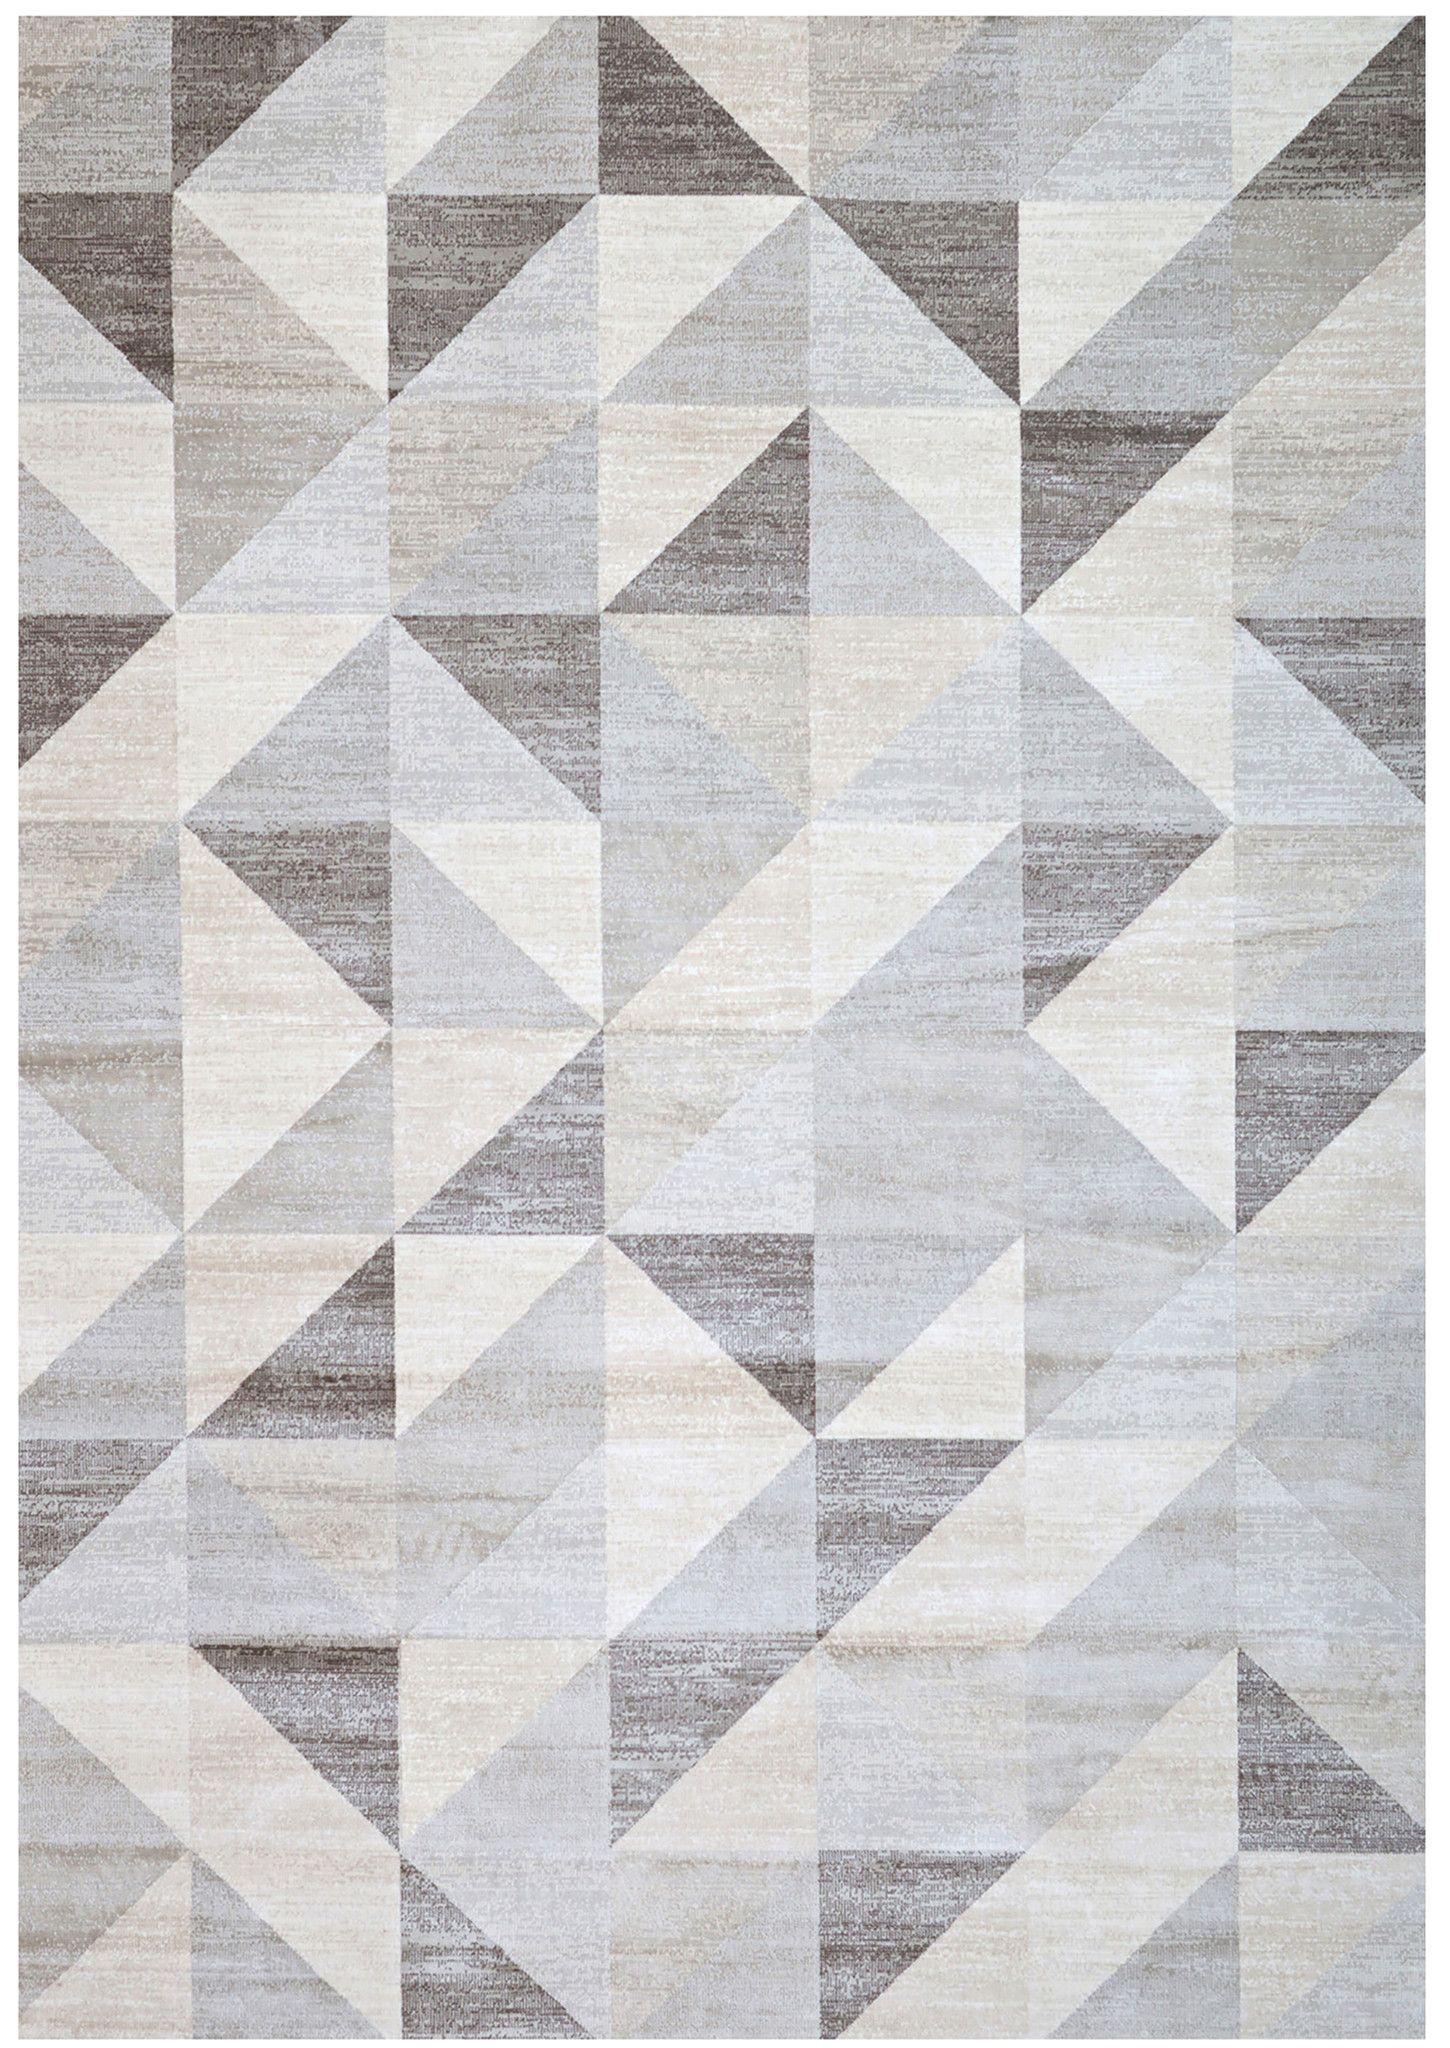 living cute elegant white area rug 5x7 modern 8 modern